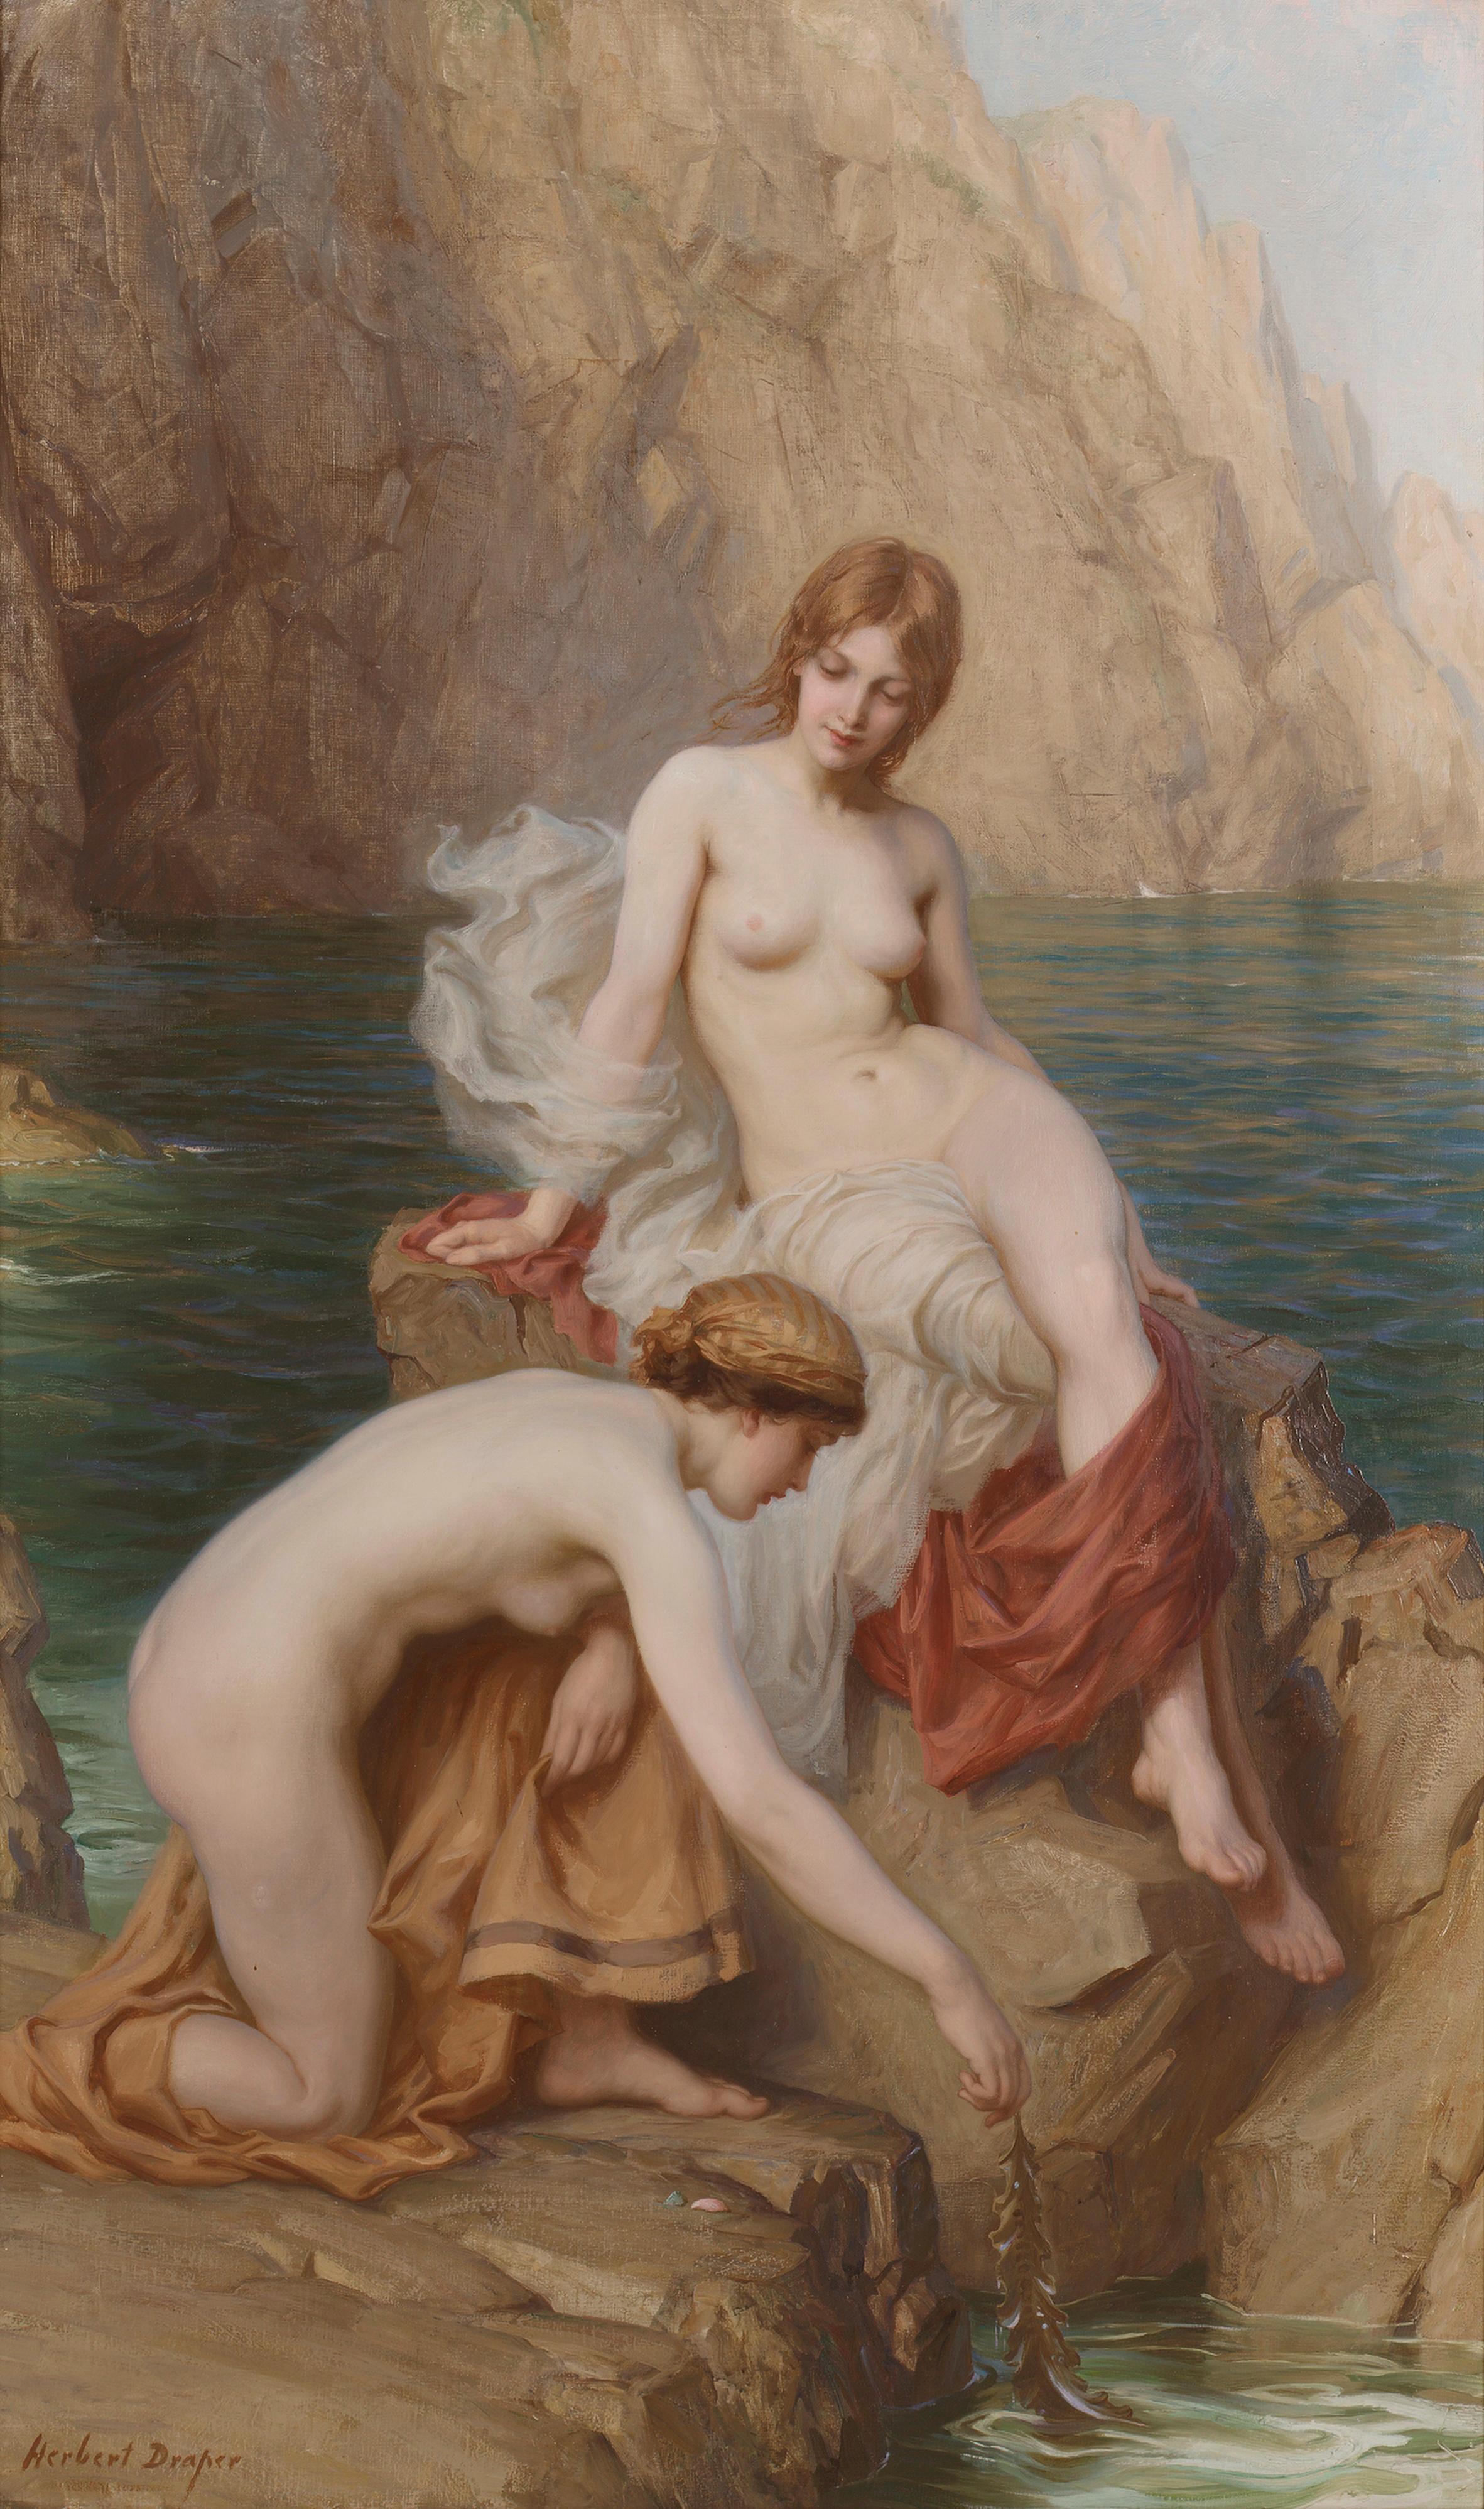 Herbert James Draper, 1864-1920. Летом на море. 127 x 76см. Частная коллекция